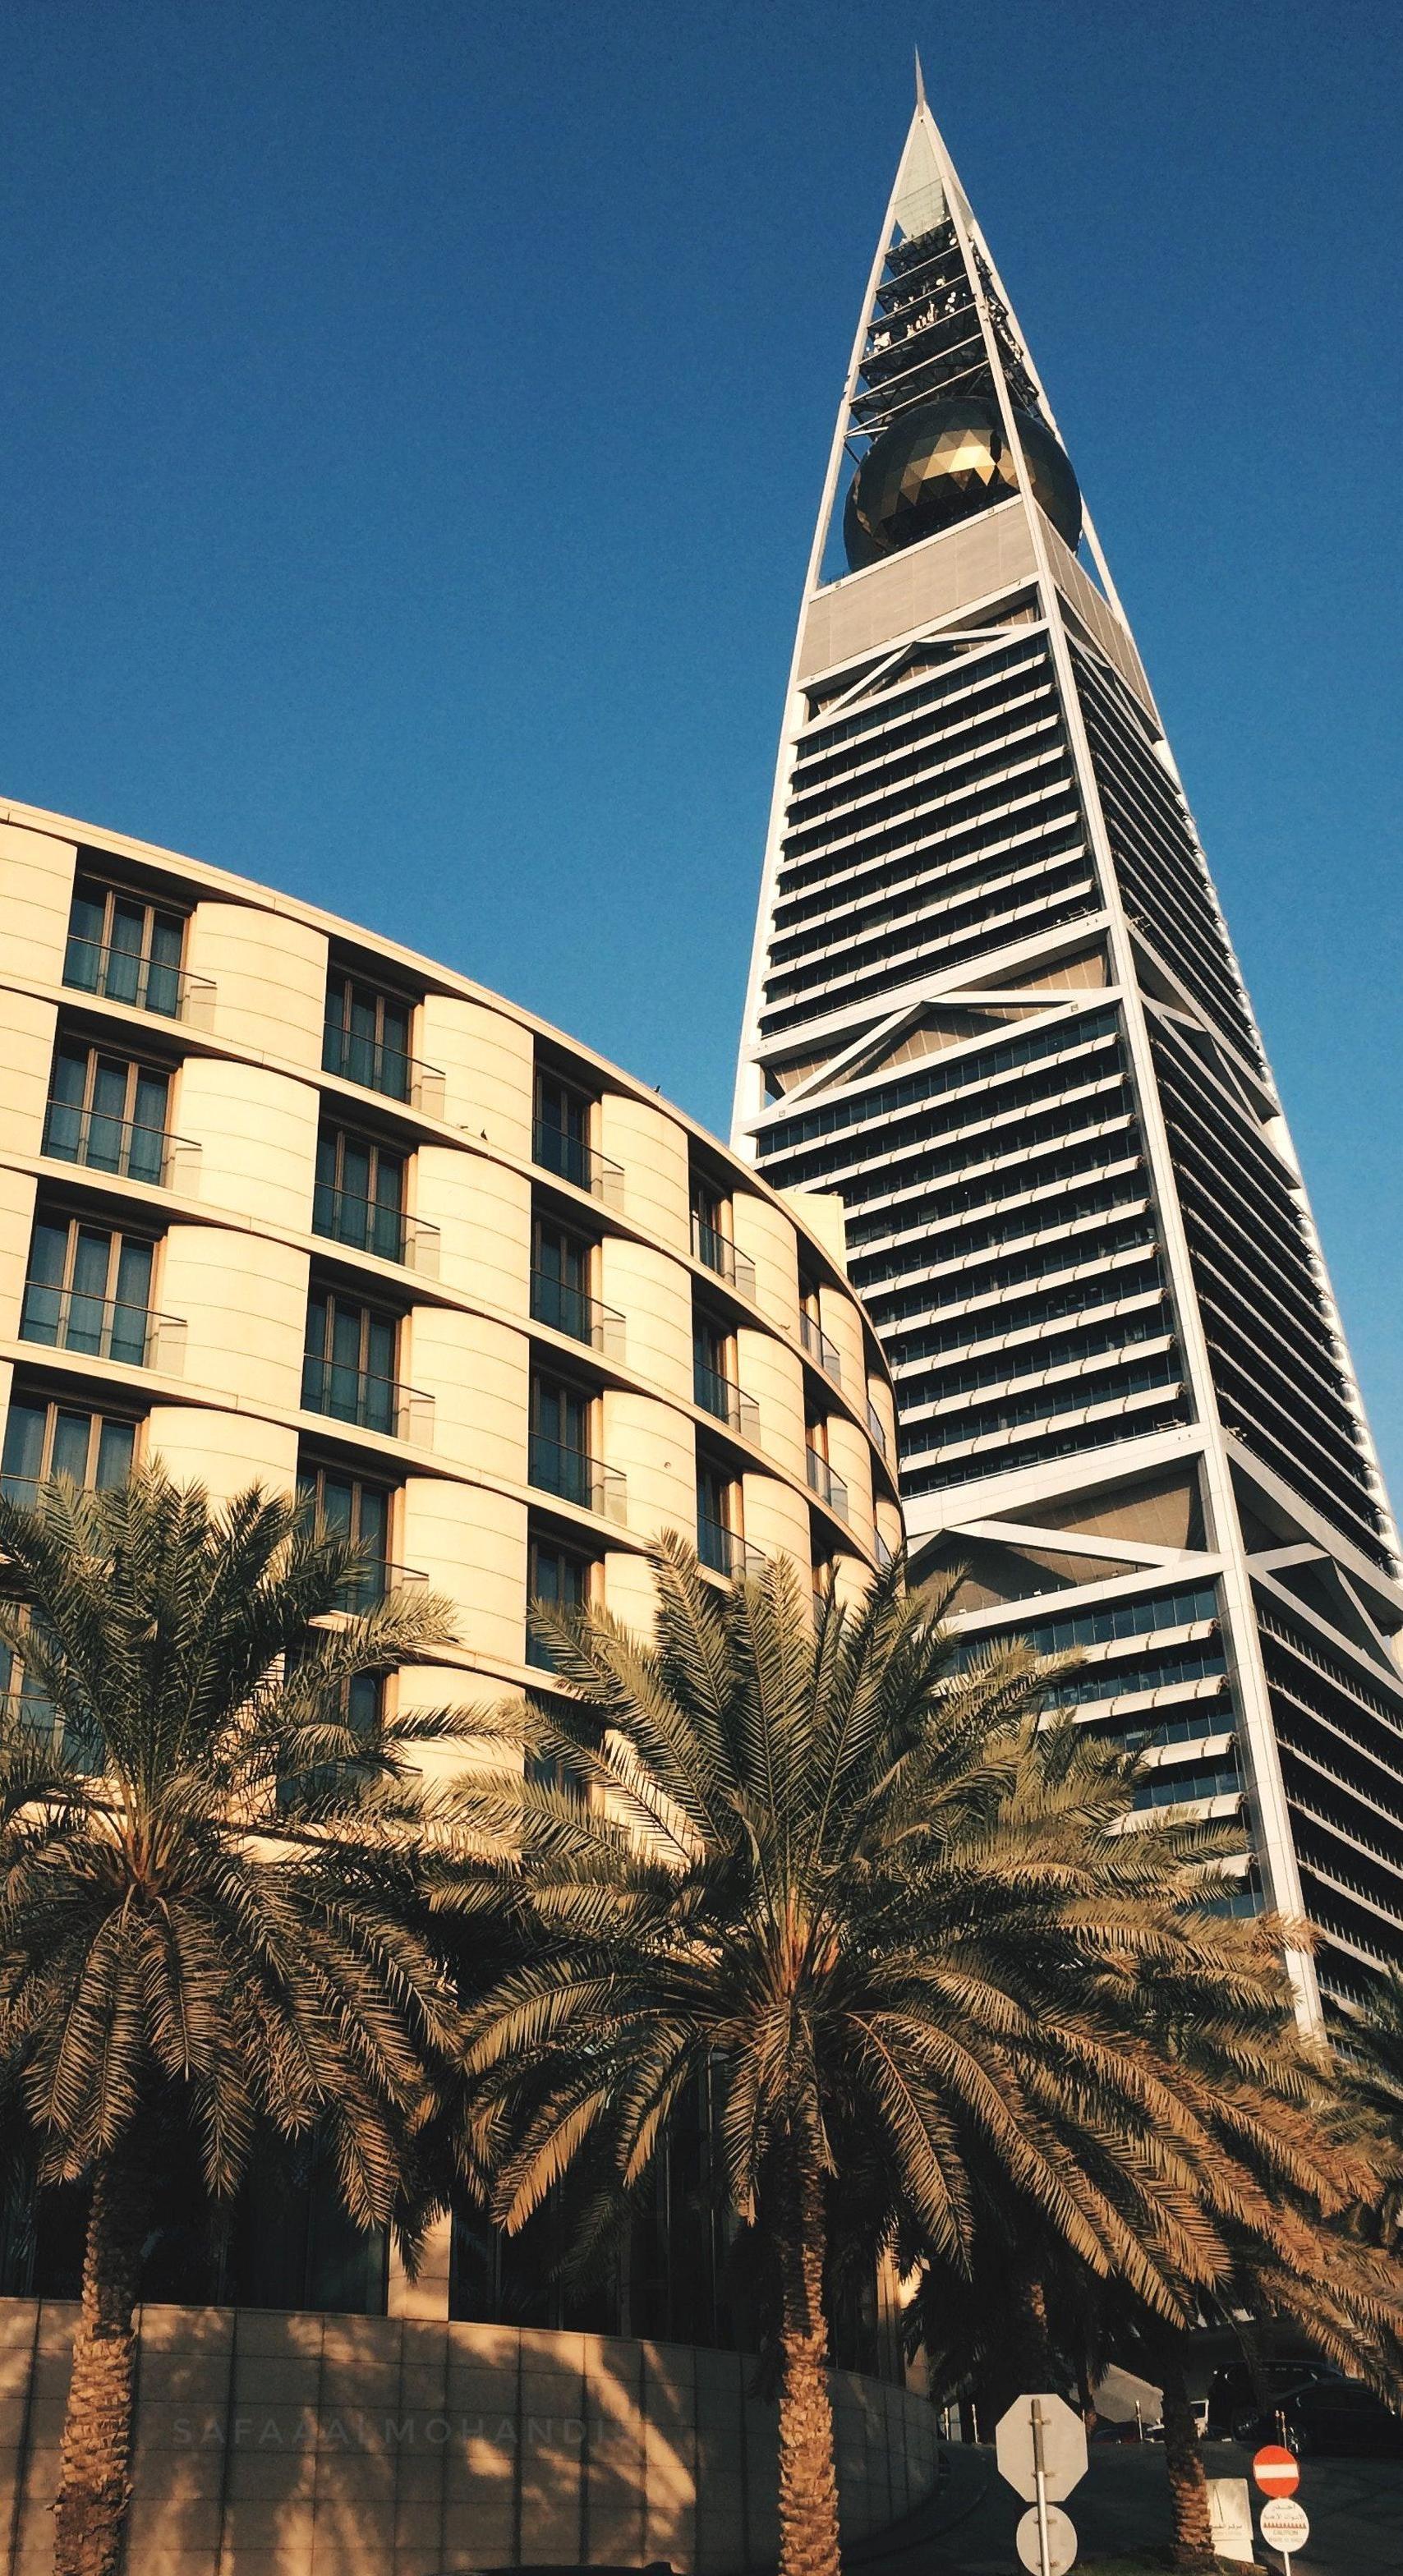 Al Faisaliah Tower Riyadh Saudi Arabia Slices Of Sky Musemage Iphone 5s F2e4d1 Riyadh Saudi Arabia National Day Saudi Around The Worlds